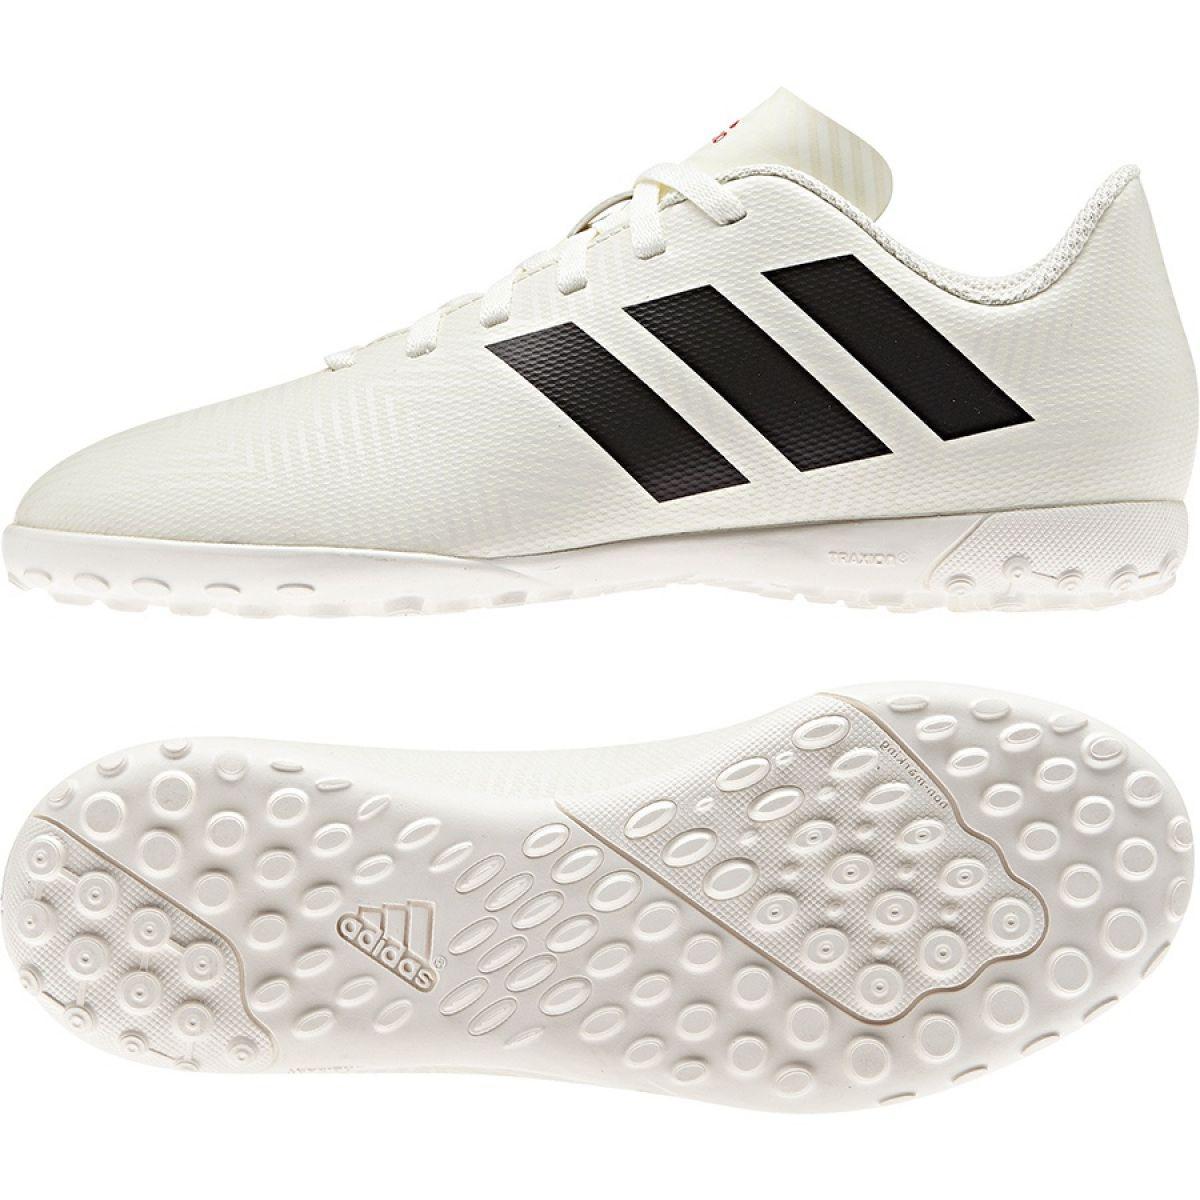 Mariner Surname Plow  Football boots adidas Nemeziz 18.4 Tf Jr CM8523 white multicolored -  ButyModne.pl